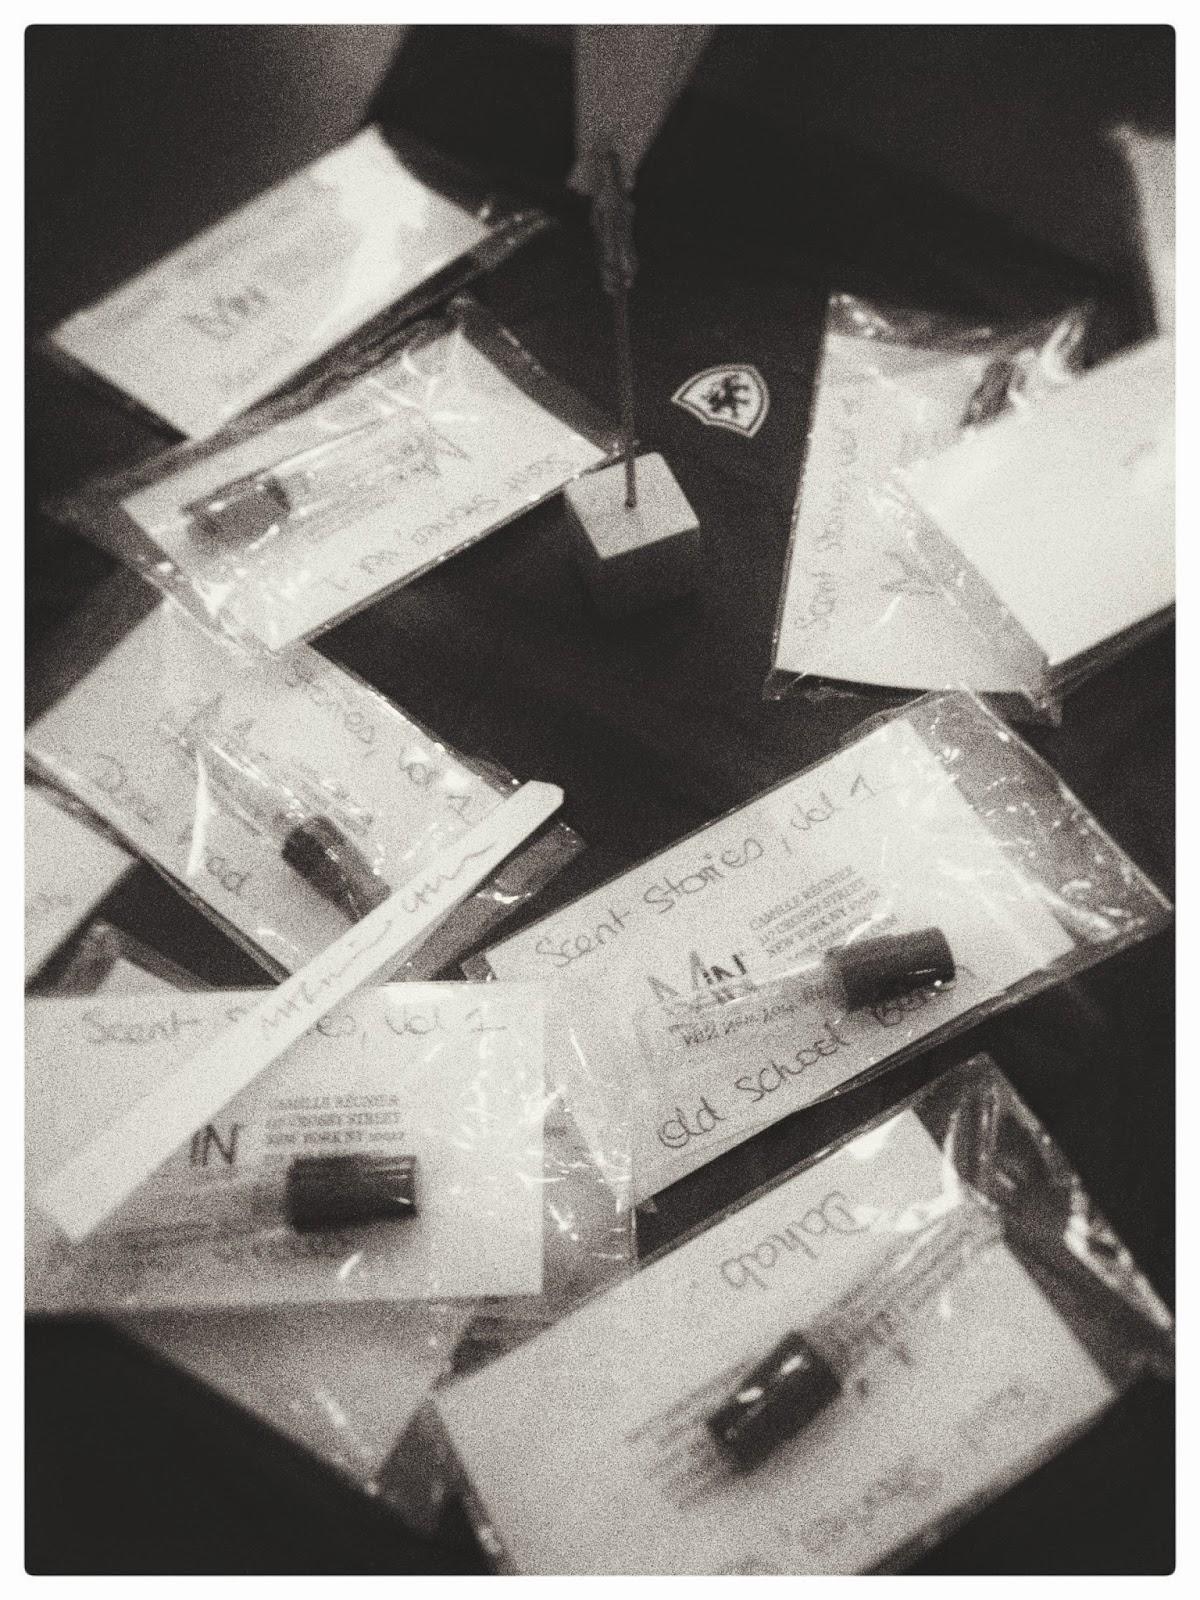 da752e739be1 The Silver Fox  Vagabond Polaroids   Scent Stories Vol I  by MiN New ...